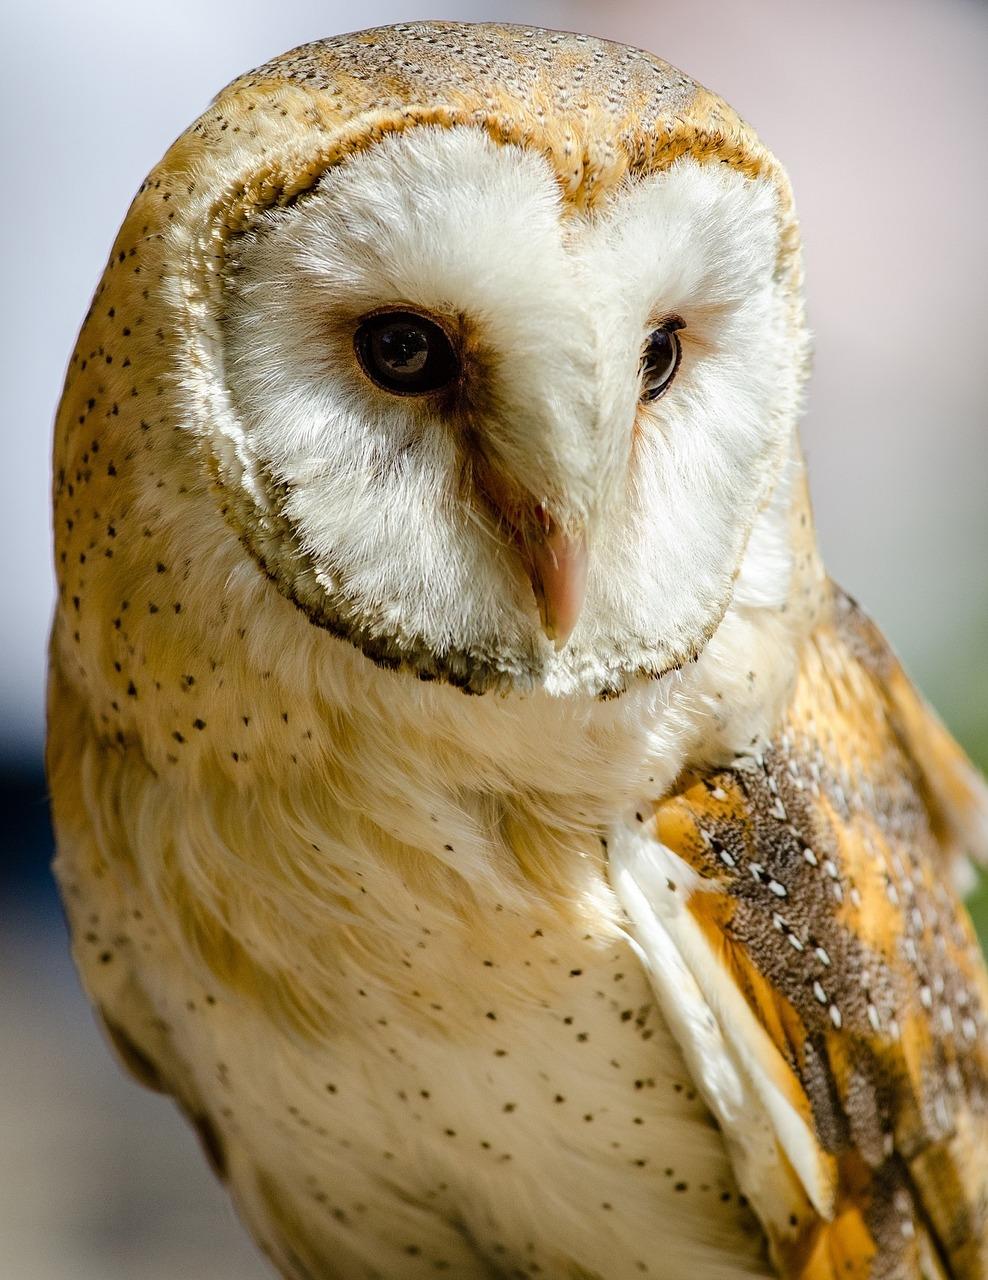 barn-owl-1180263_1280.jpg